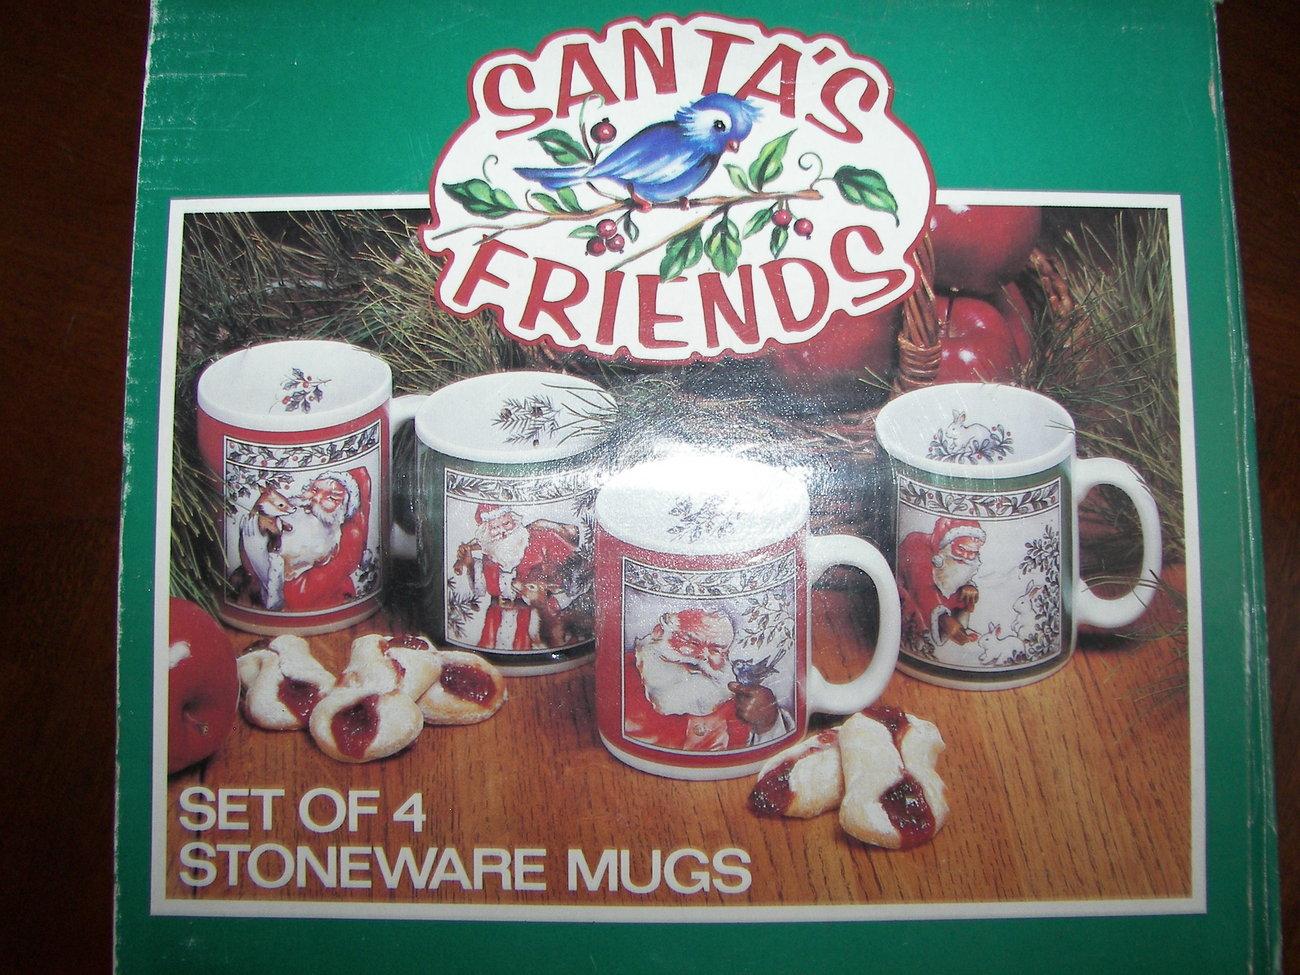 Set of 4 Christmas Mugs Stoneware Coffecups